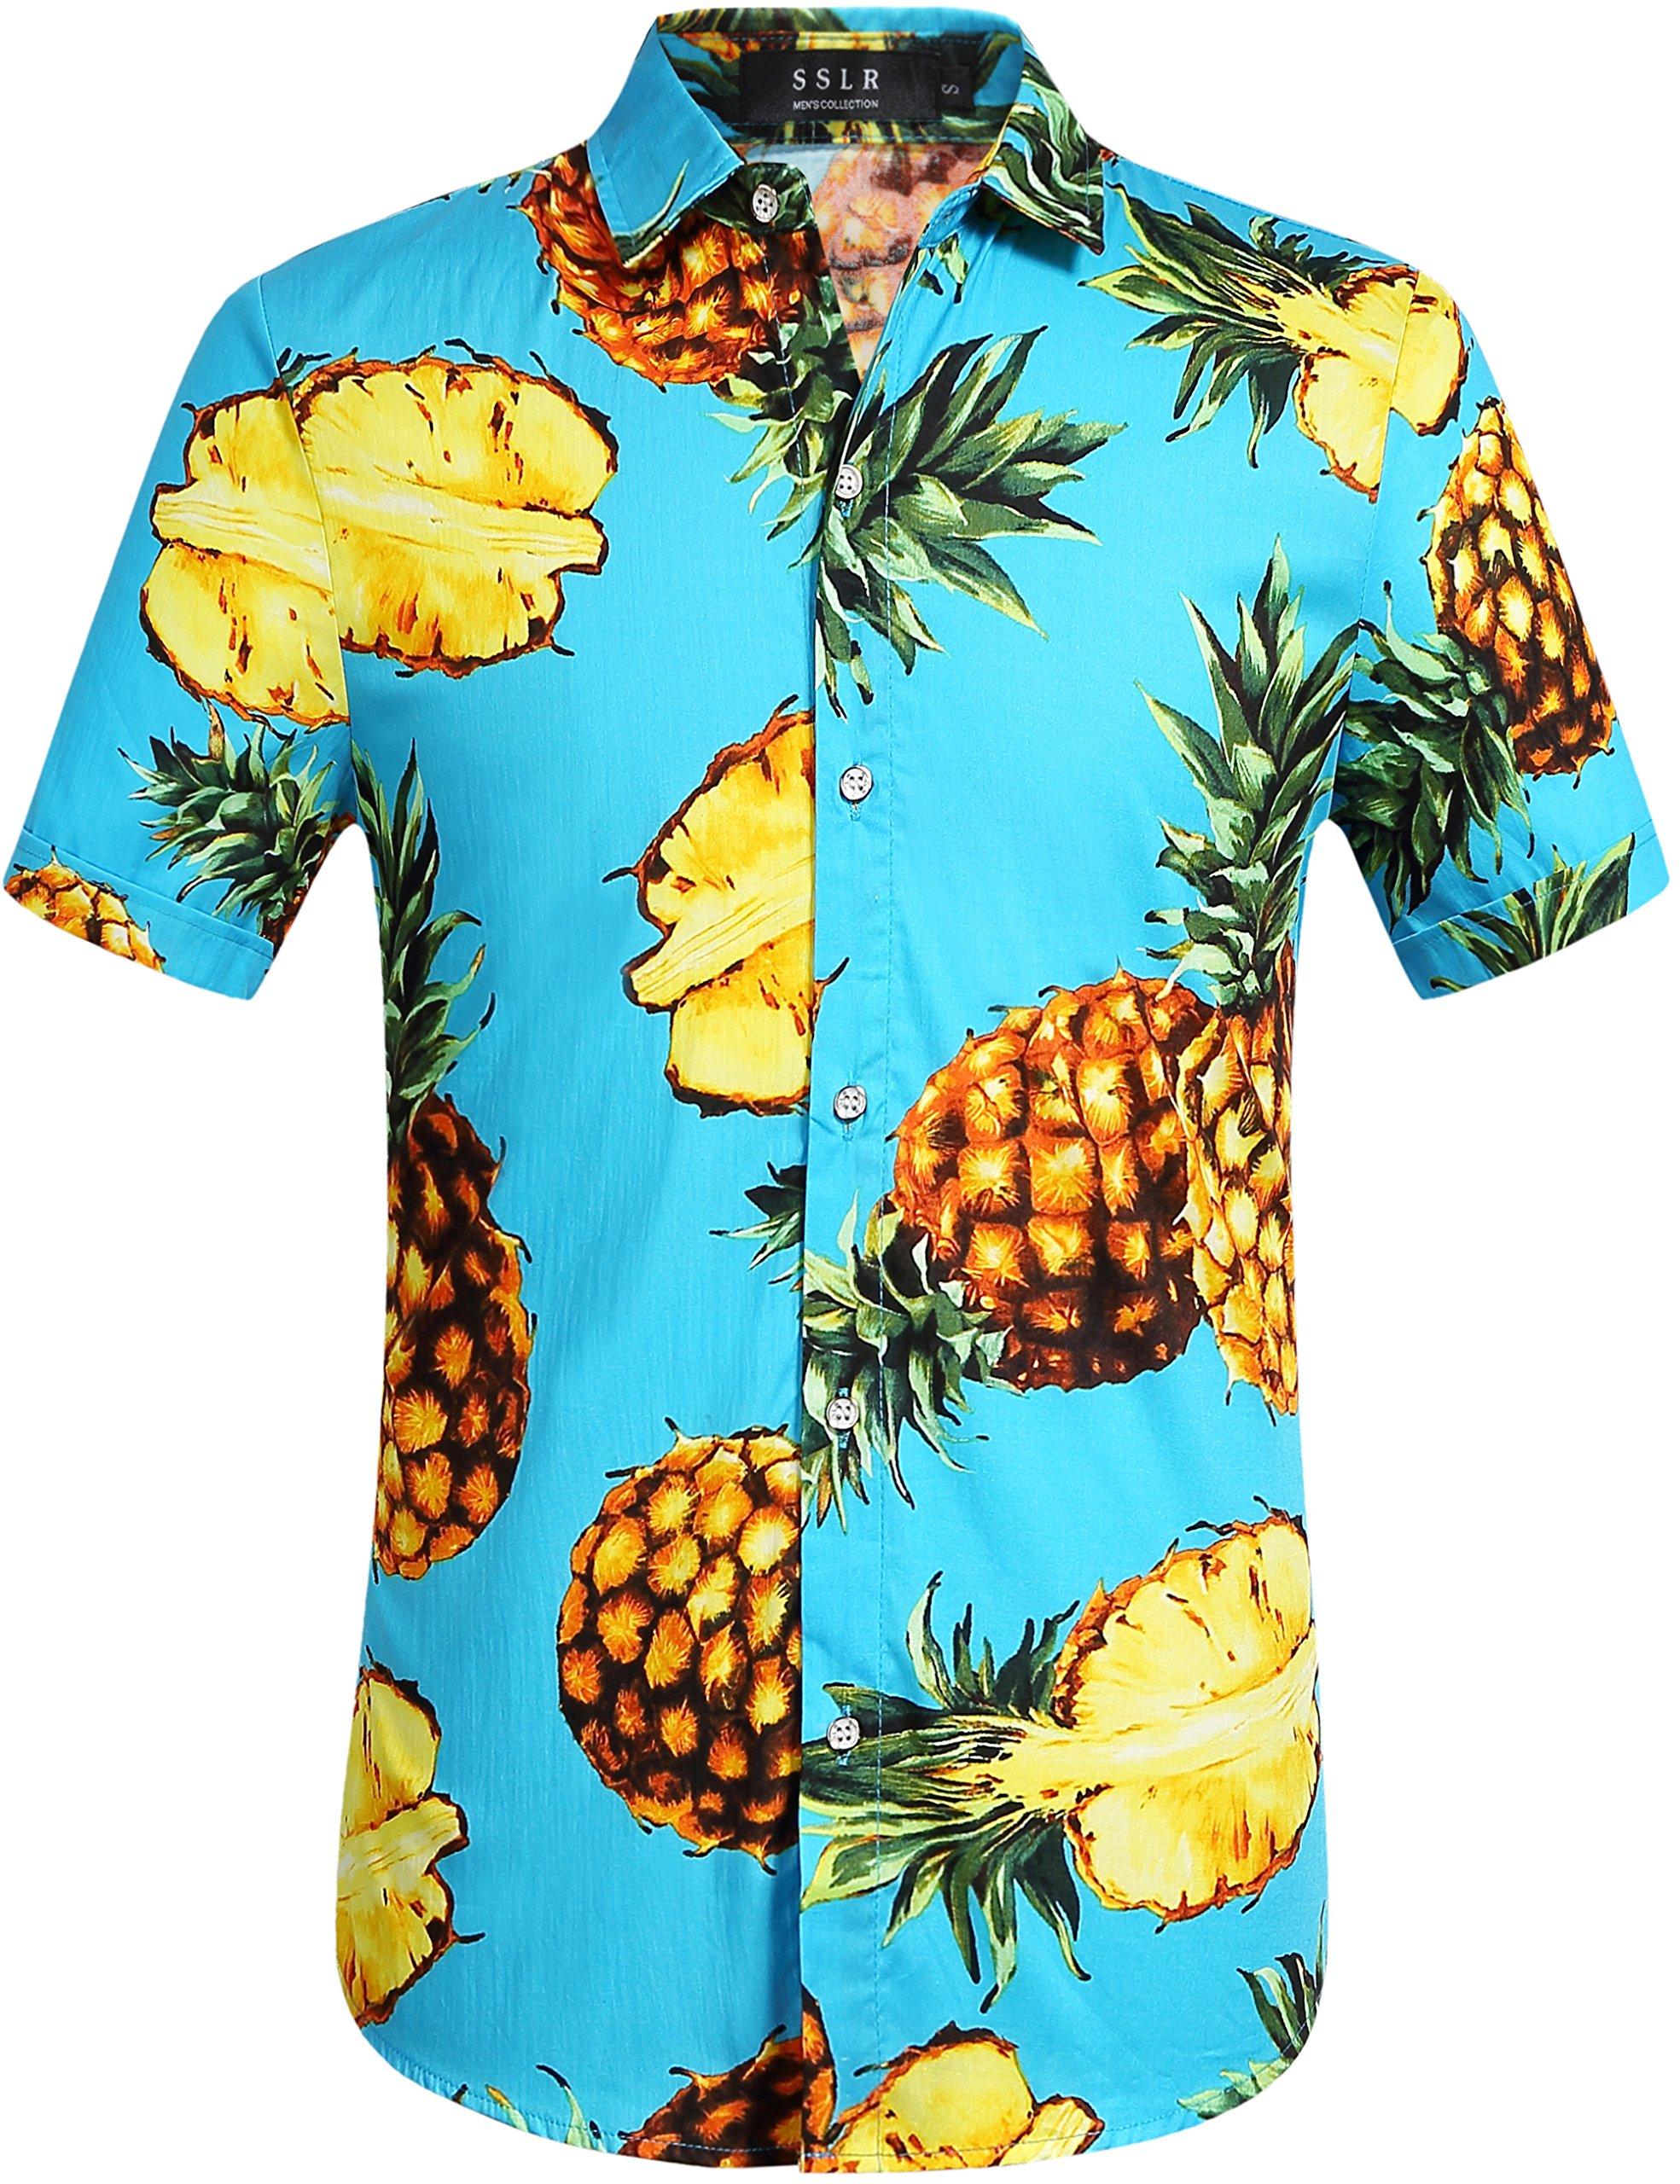 d7be1a29 Galleon - SSLR Men's Pineapple Short Sleeve Aloha Cotton Hawaiian Shirts  (Small, Sky Blue)